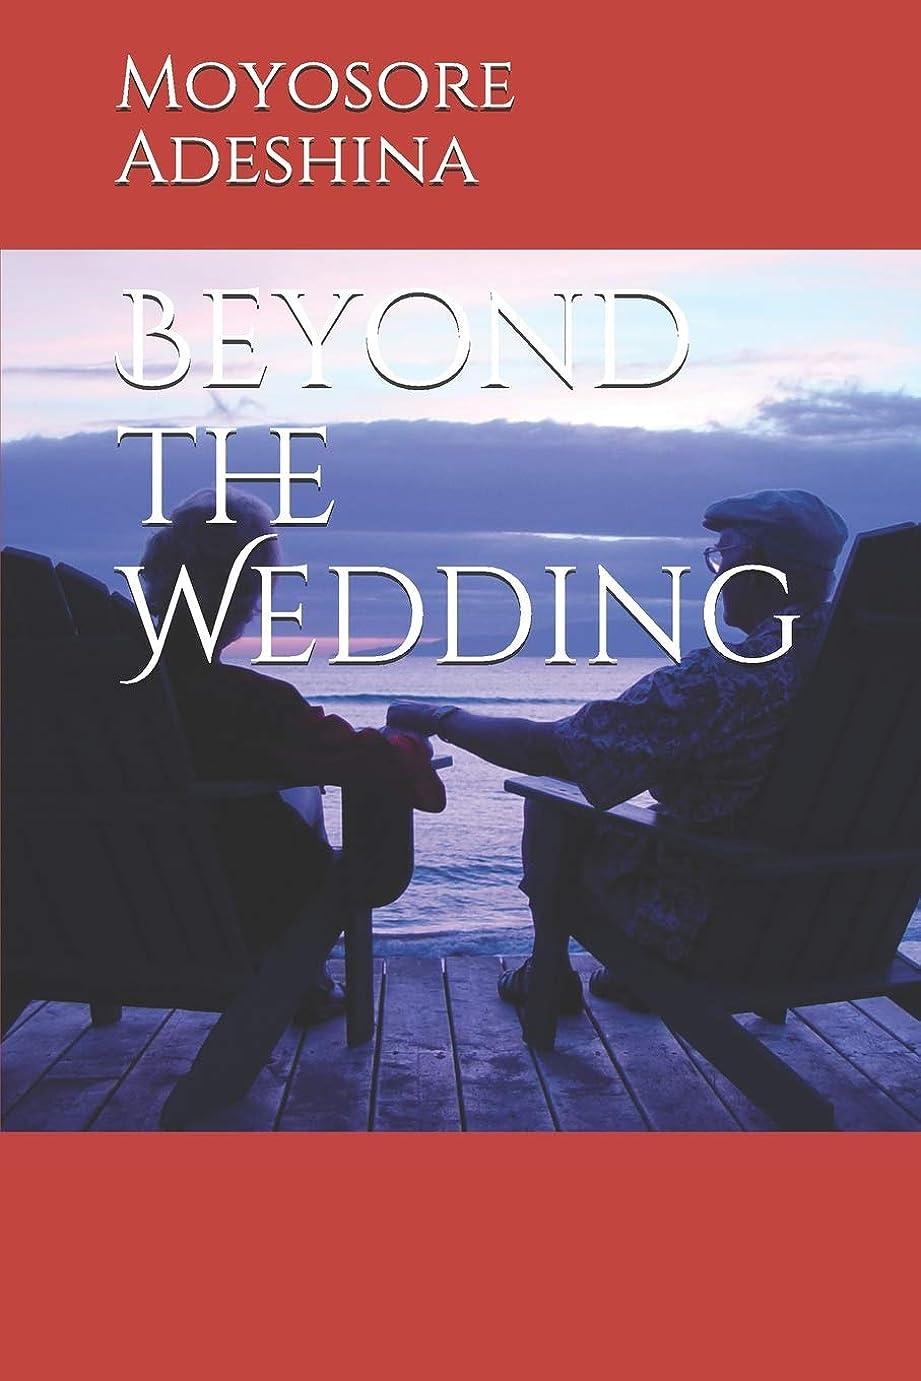 通貨面倒積極的にBeyond the Wedding